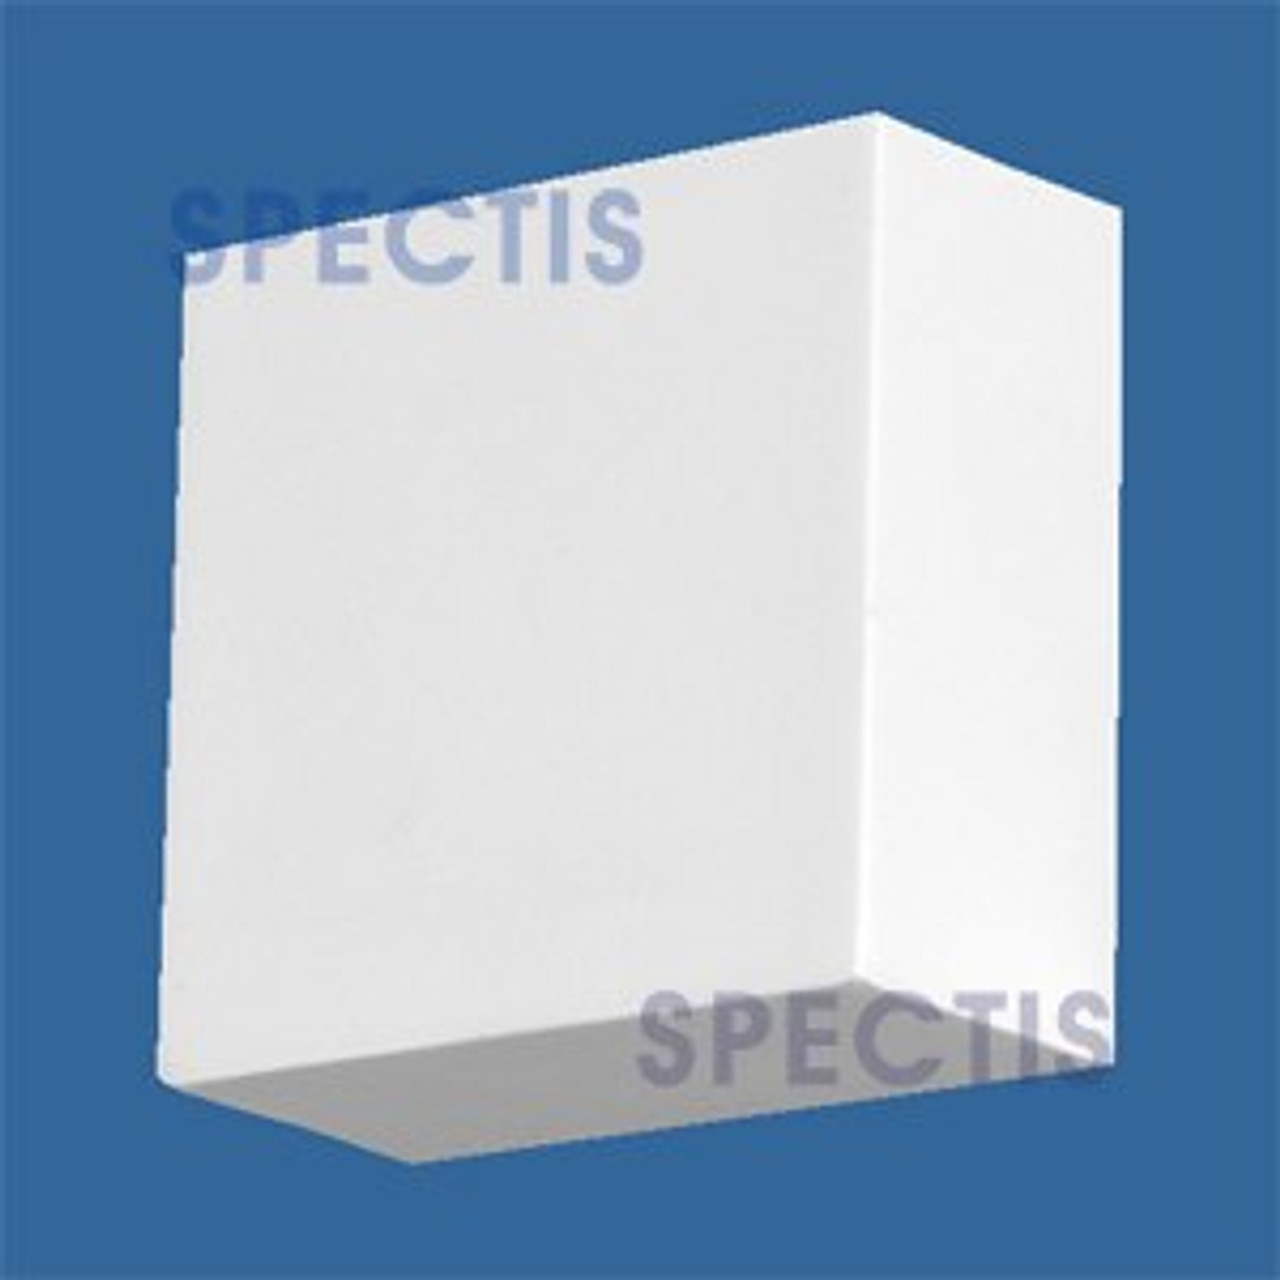 "BL2684 Corbel Block or Eave Bracket 3.25""W x 1.5""H x 6.4"" P"